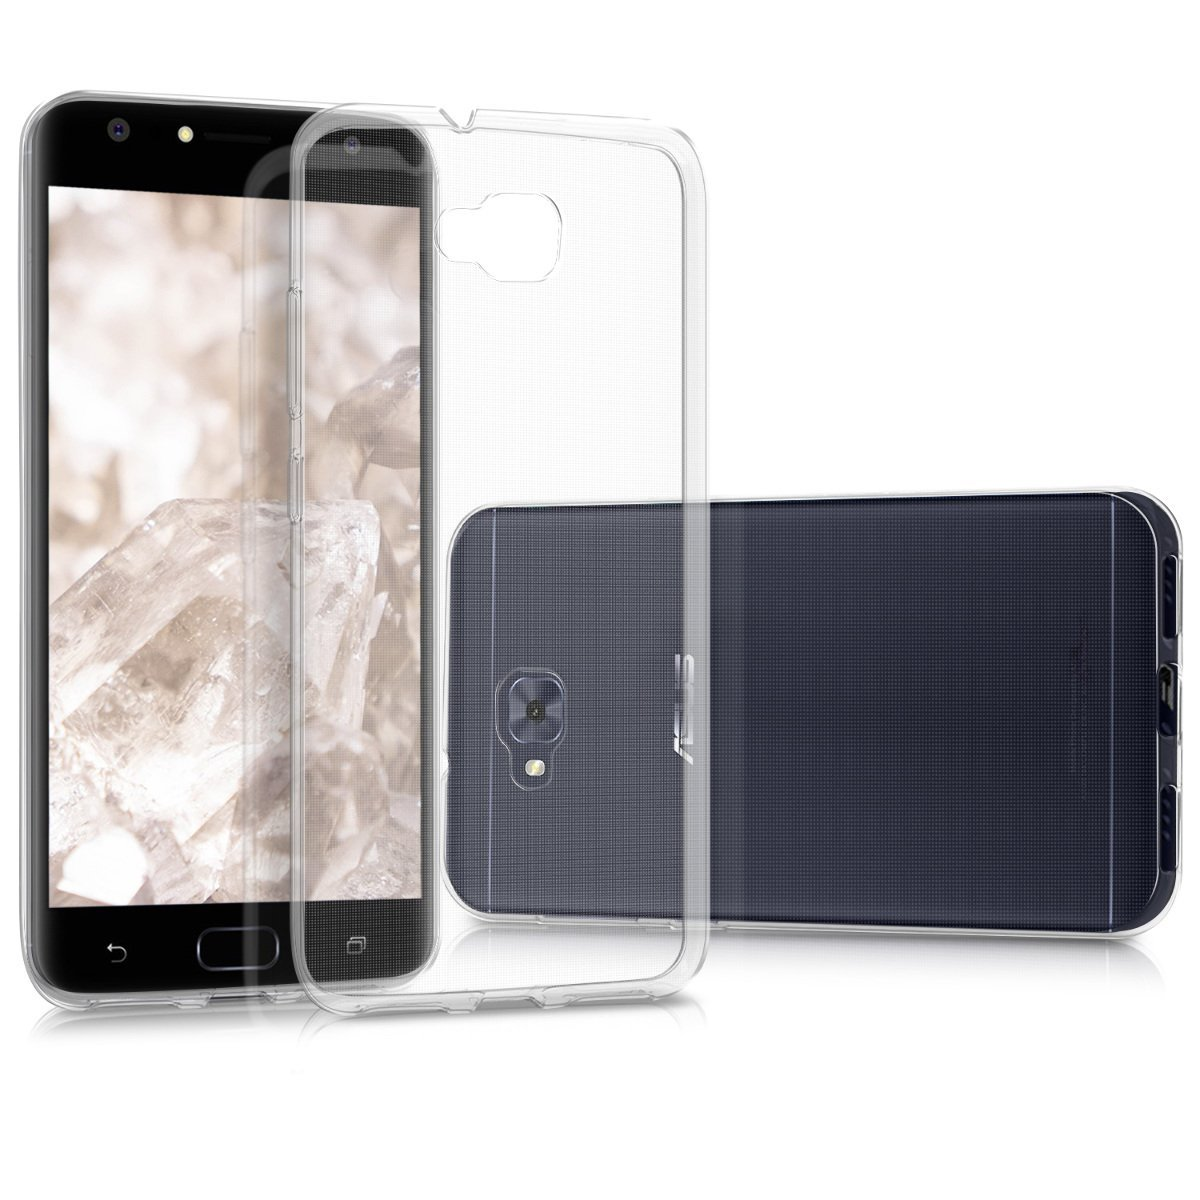 KW Διάφανη Θήκη Σιλικόνης Asus Zenfone 4 Selfie - Clear (42968.03) θήκες κινητών